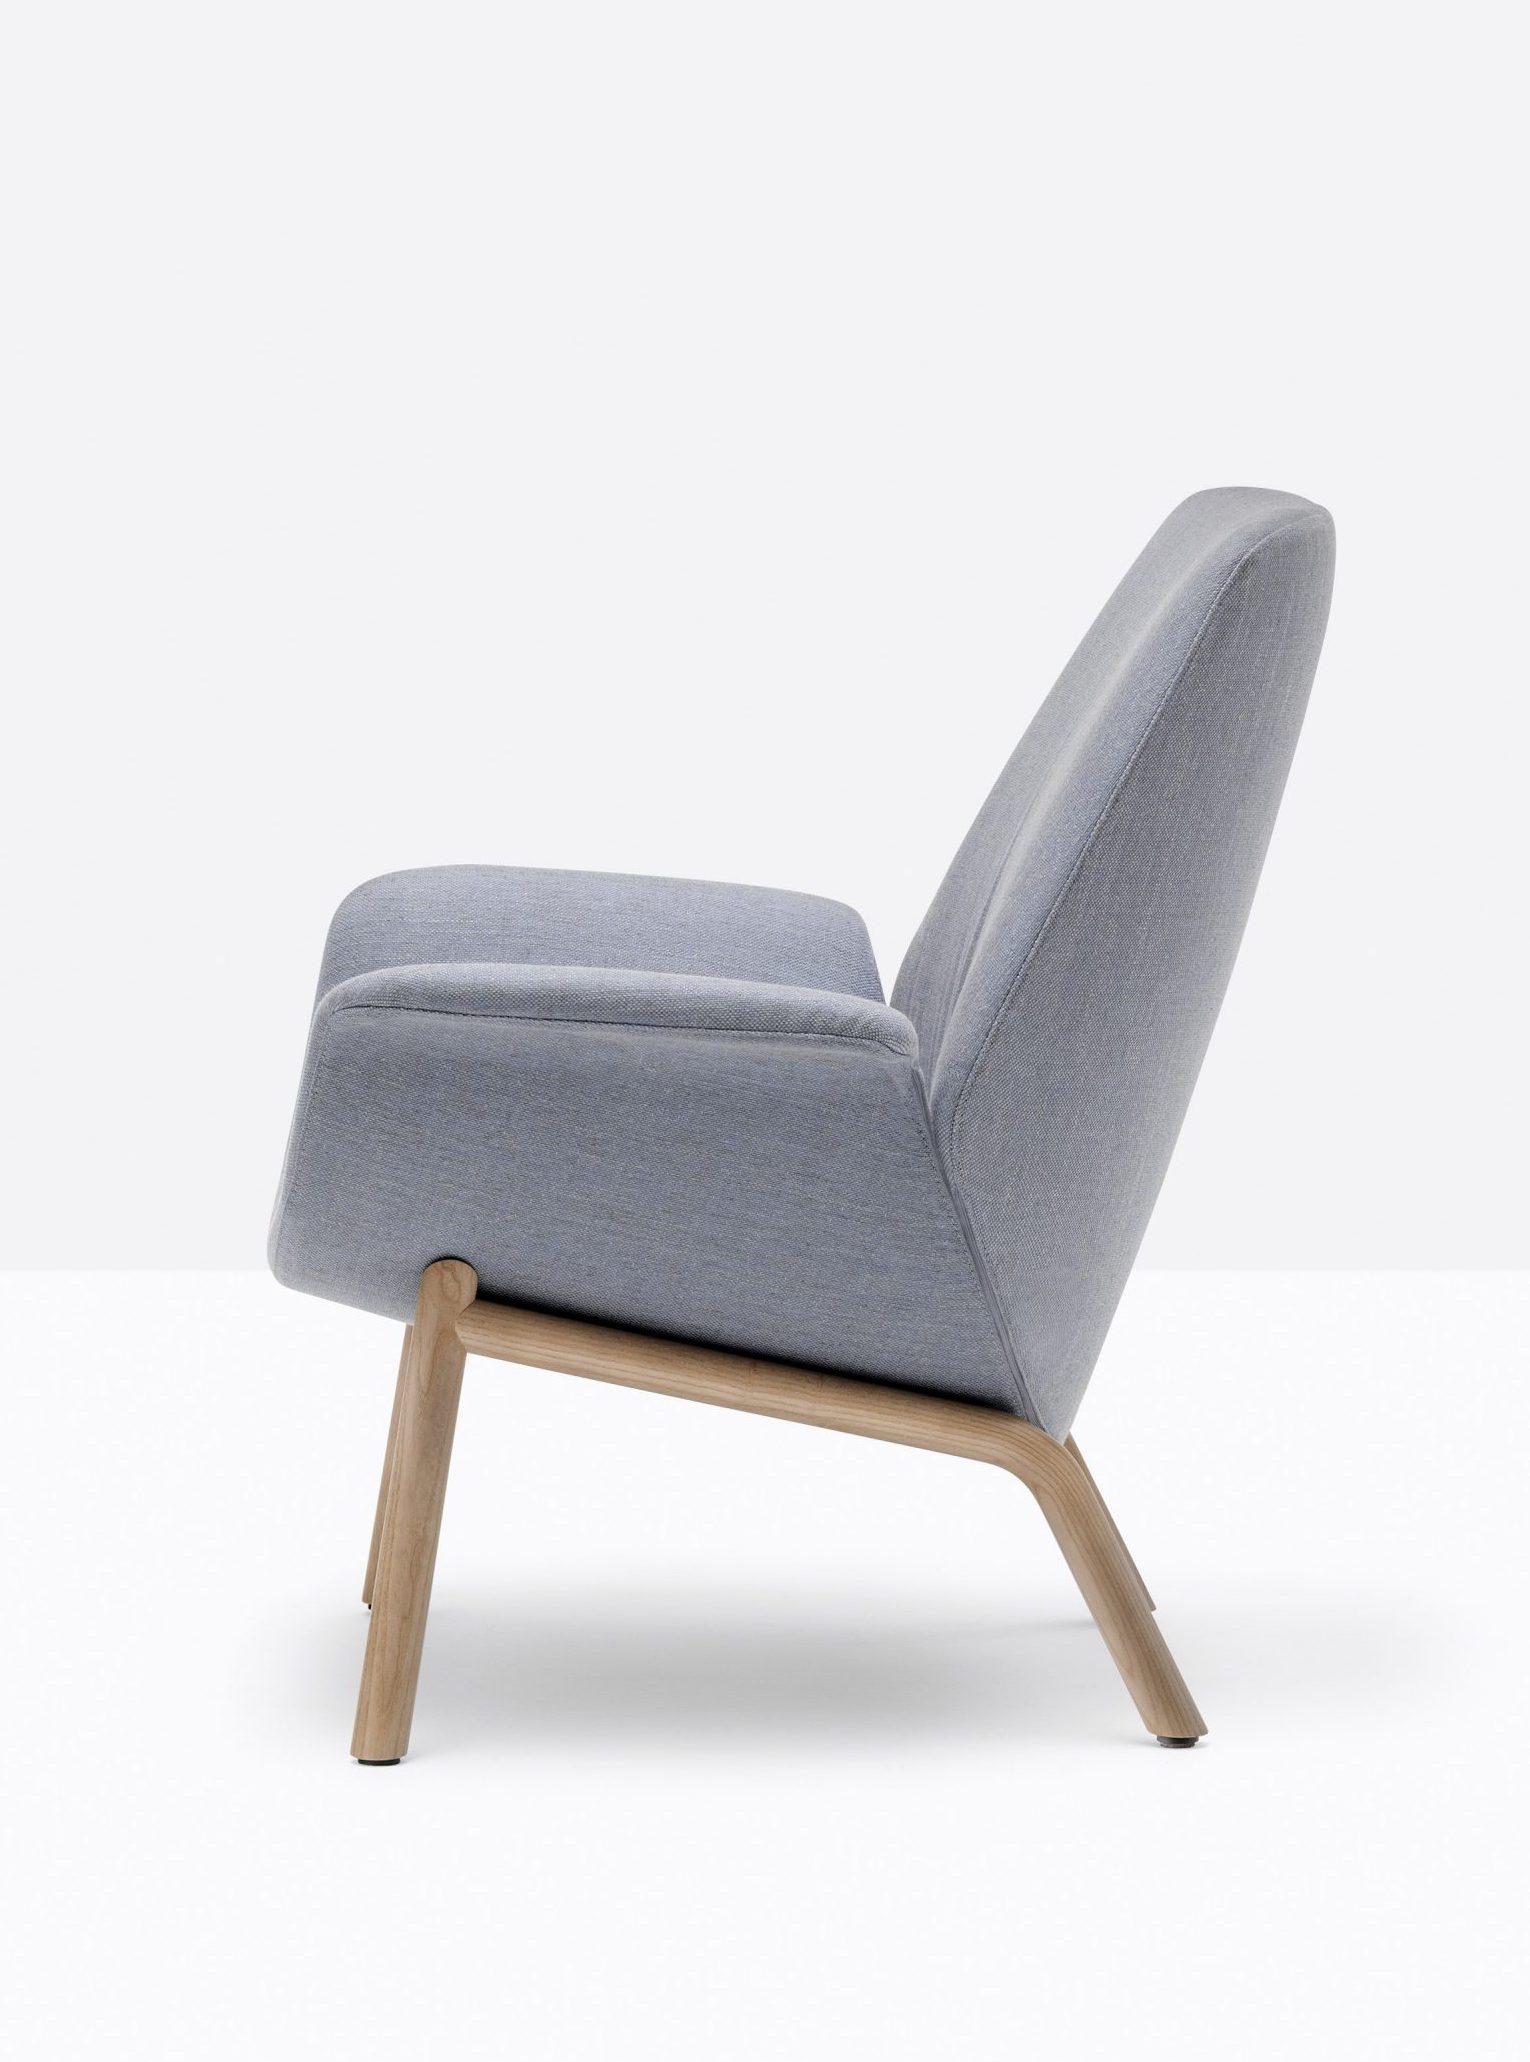 A photo of a grey armchair